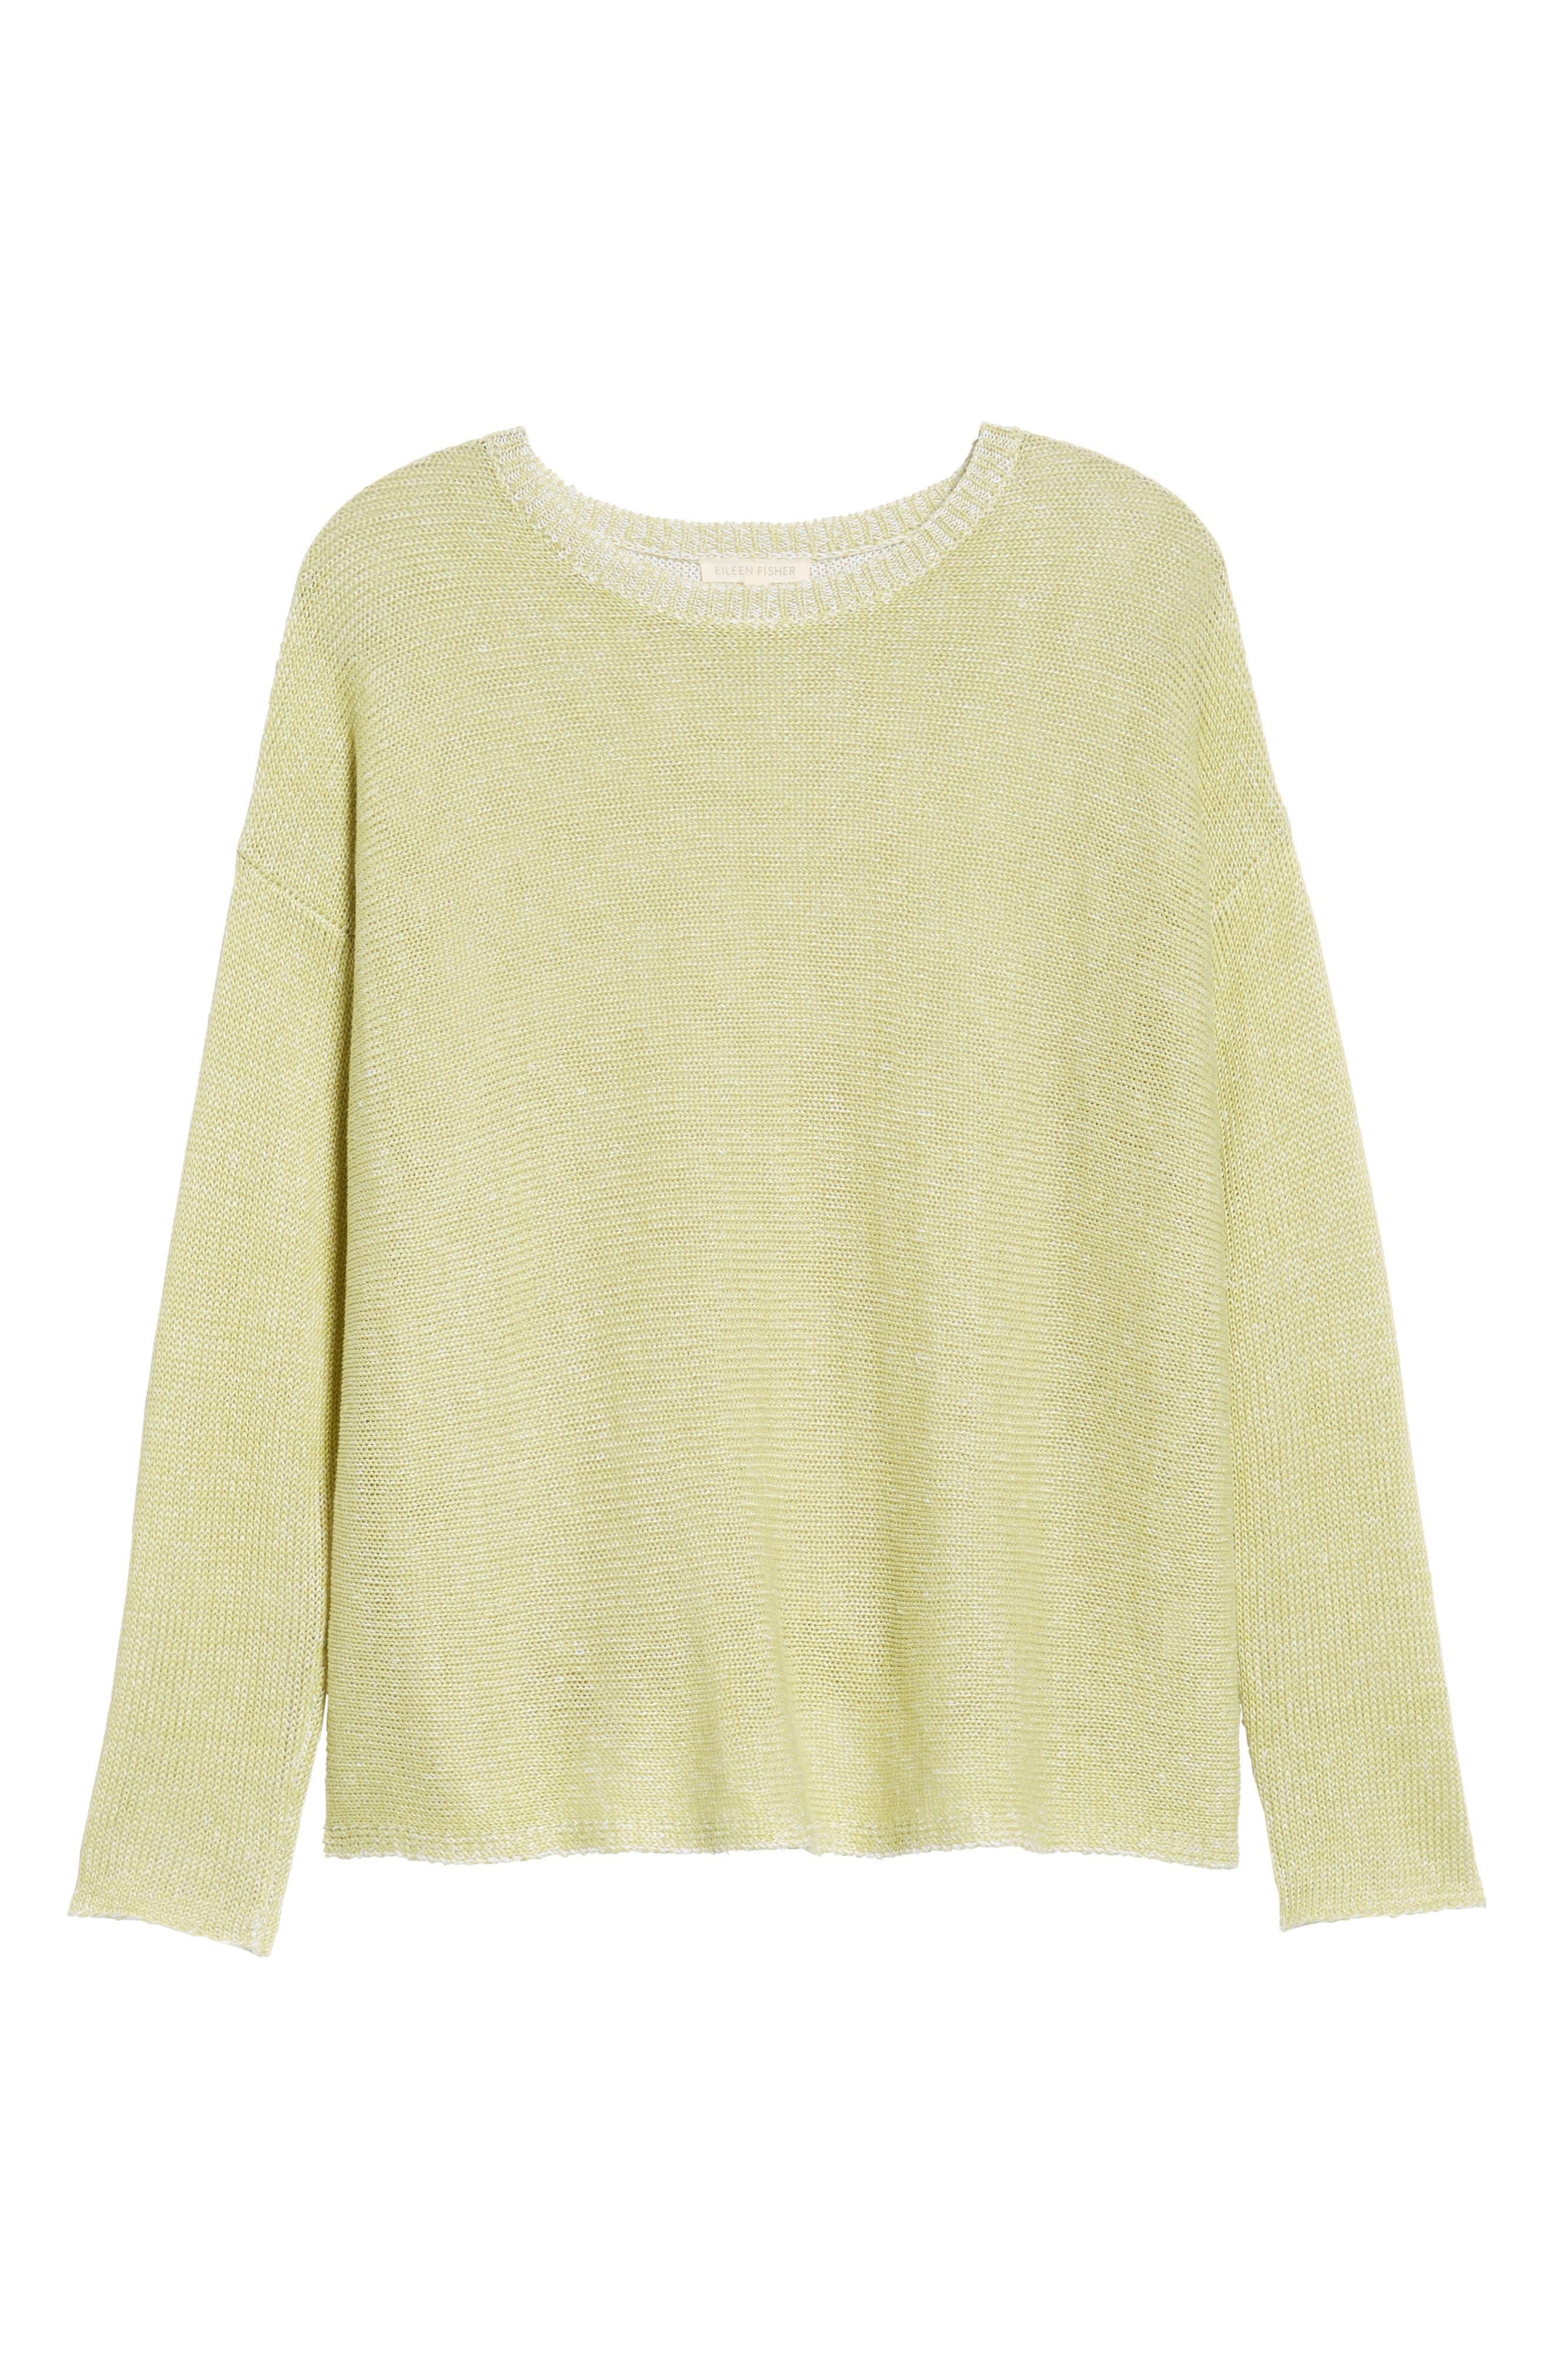 Boxy Organic Linen Sweater,                             Alternate thumbnail 6, color,                             Verbena